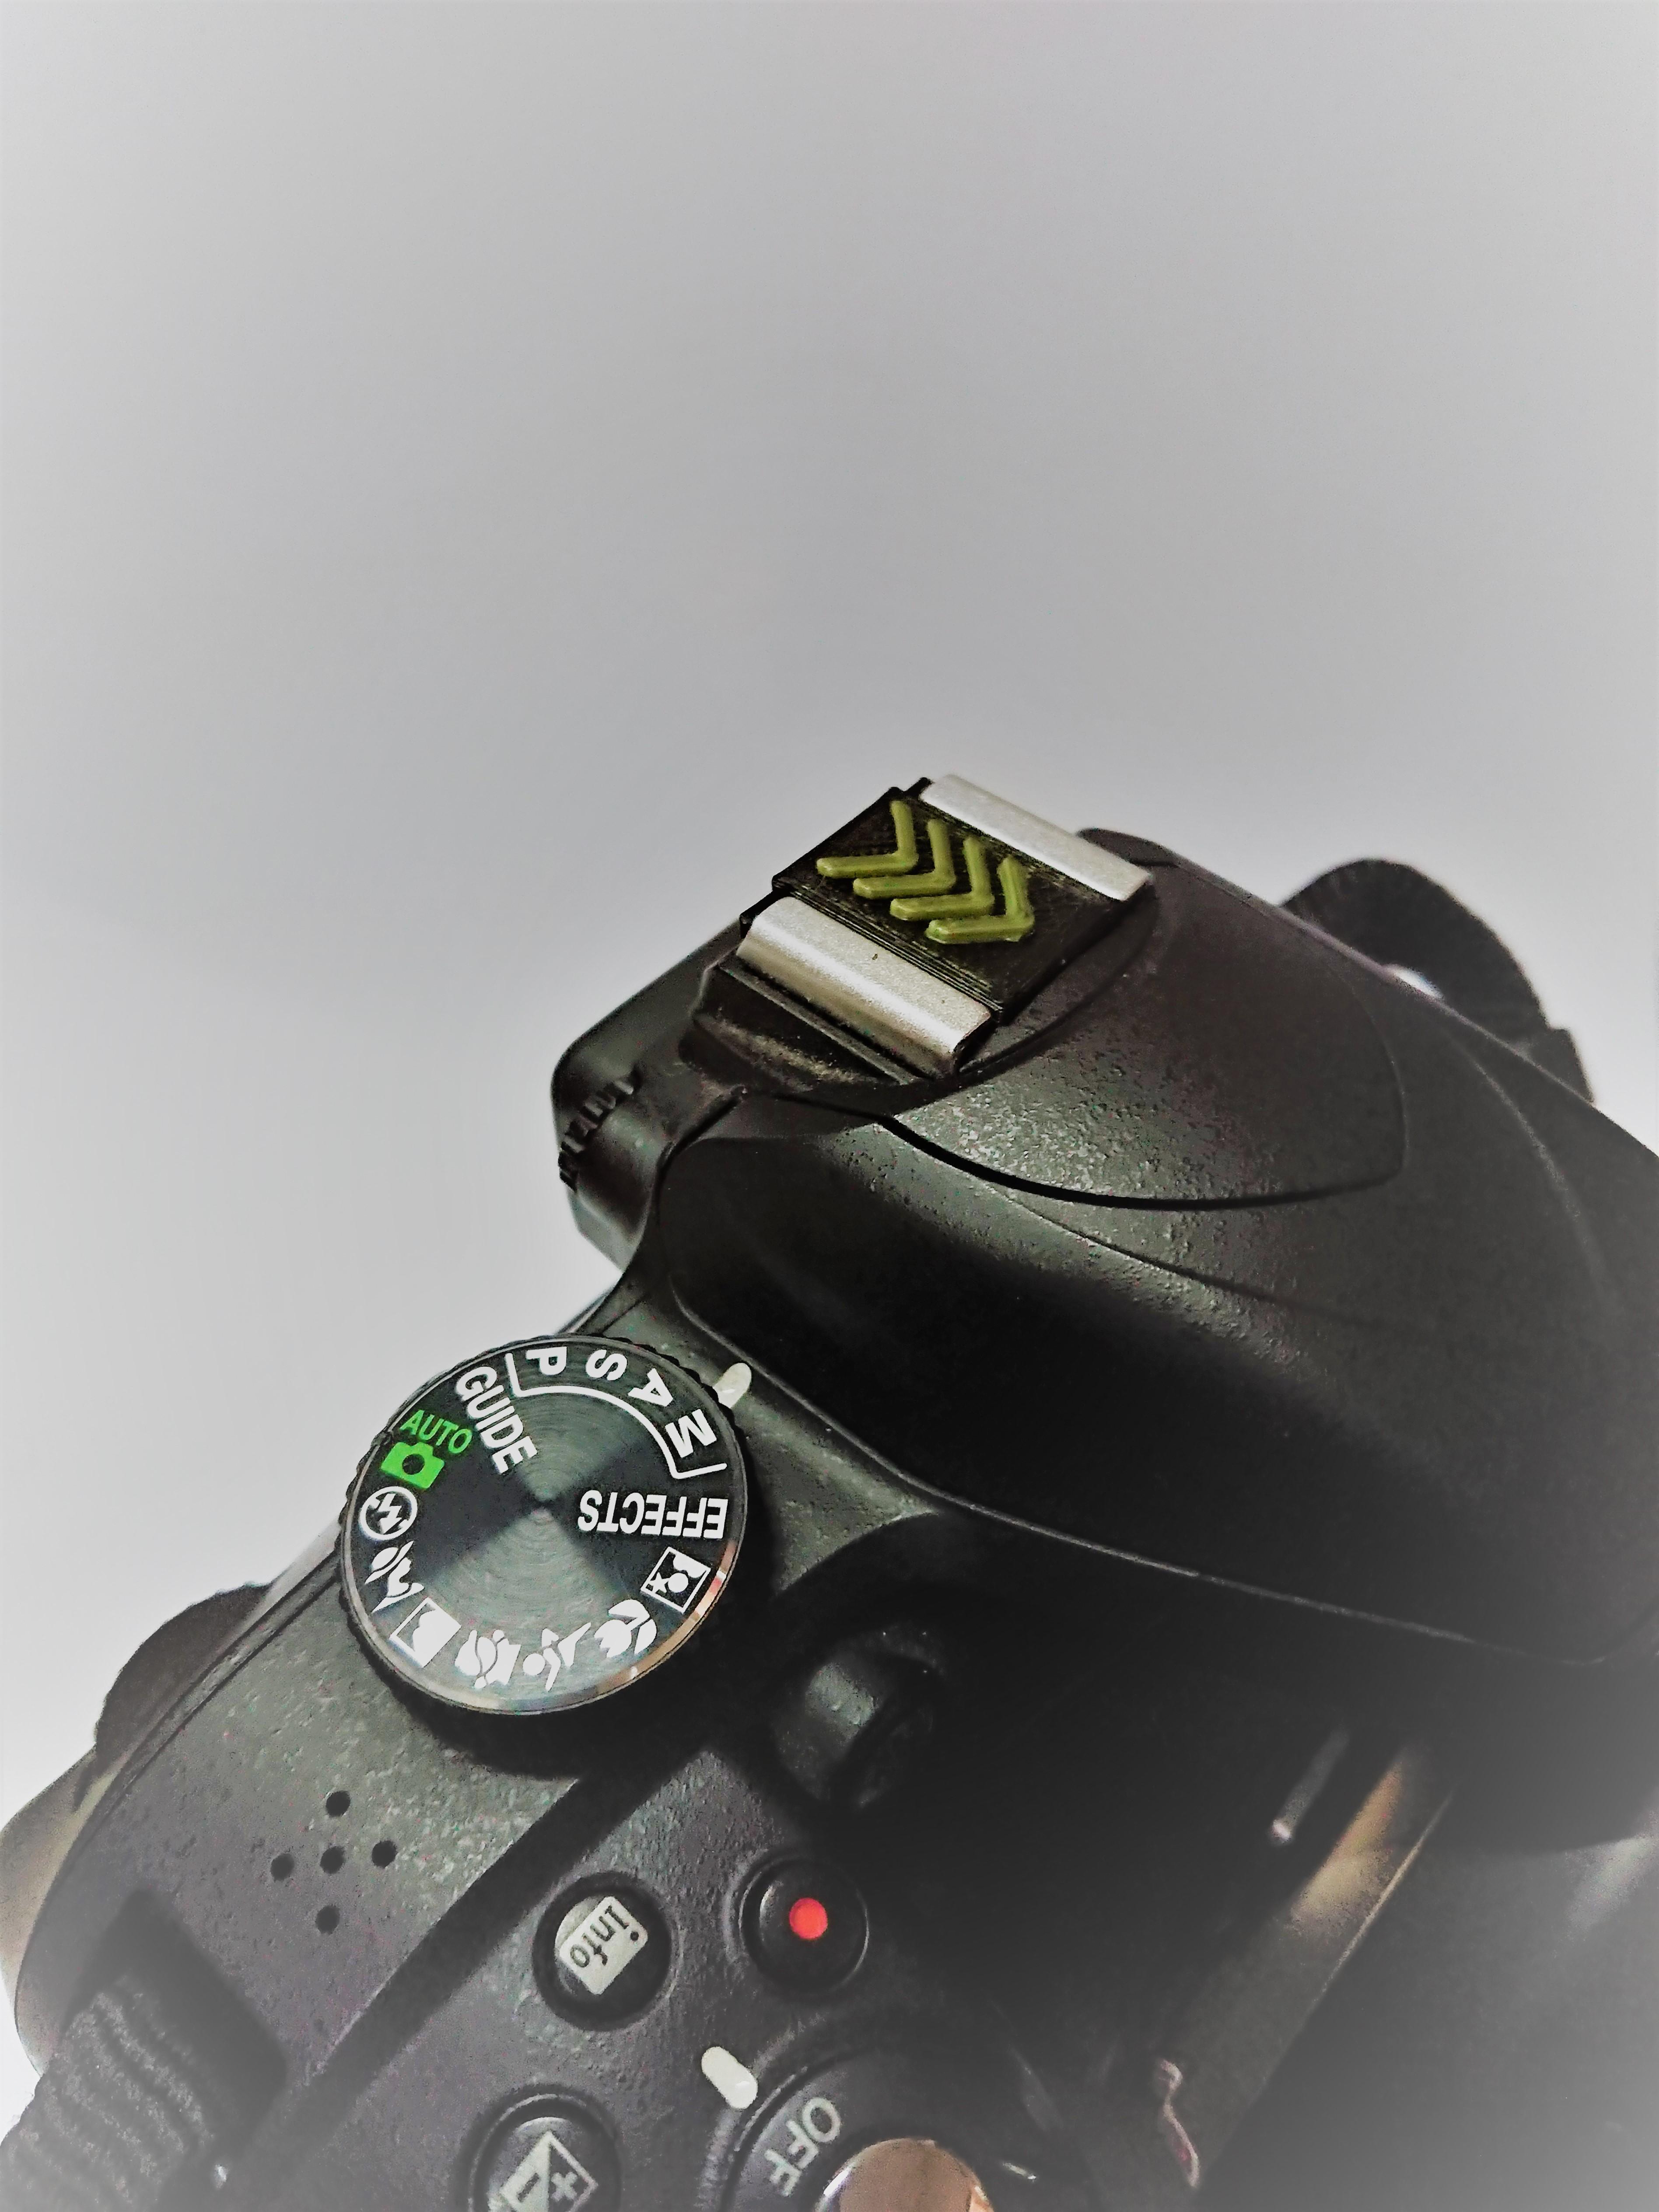 DSC_2638.JPG Download free STL file Camera Hot Shoe Cover • 3D print template, chienline